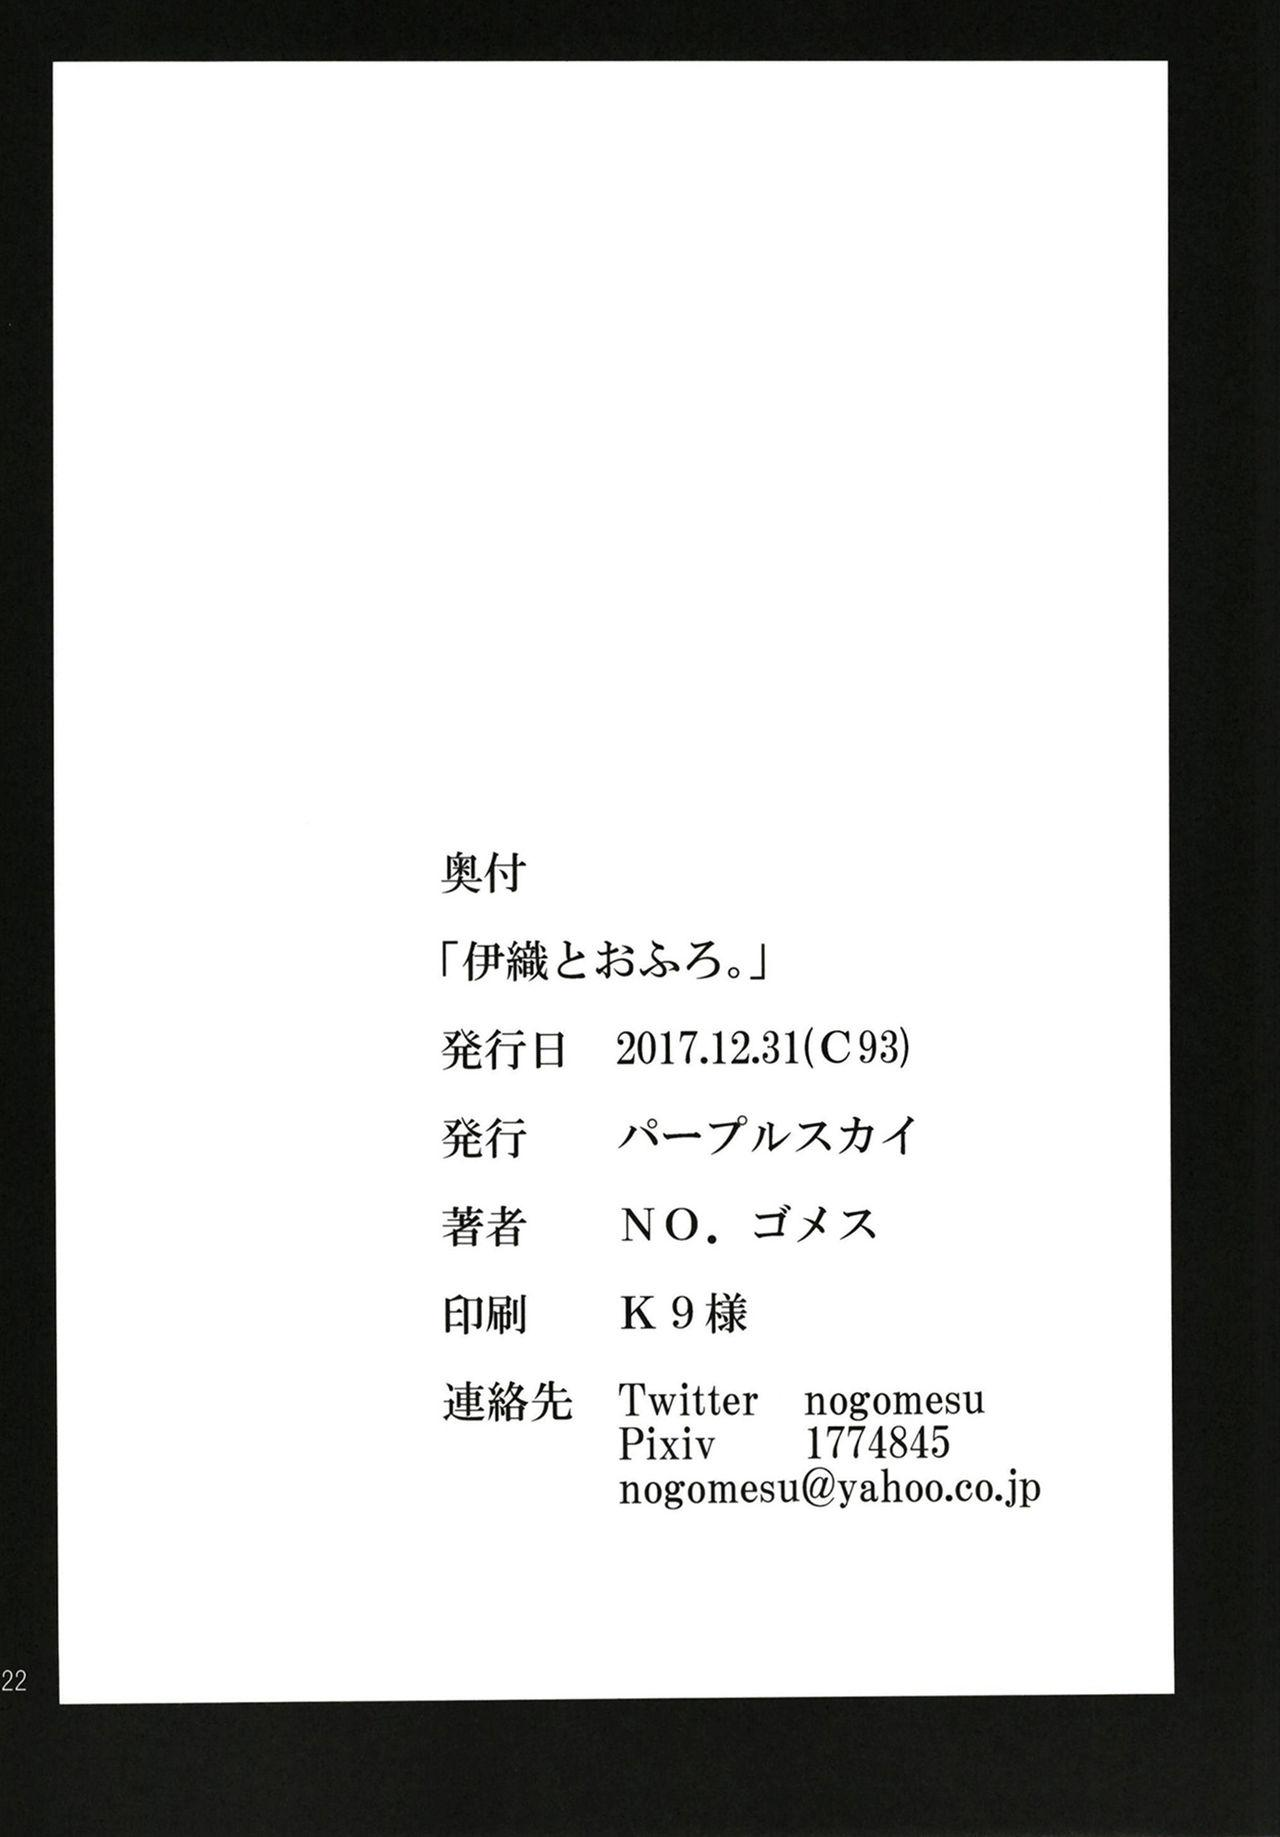 Iori to Ofuro. 20